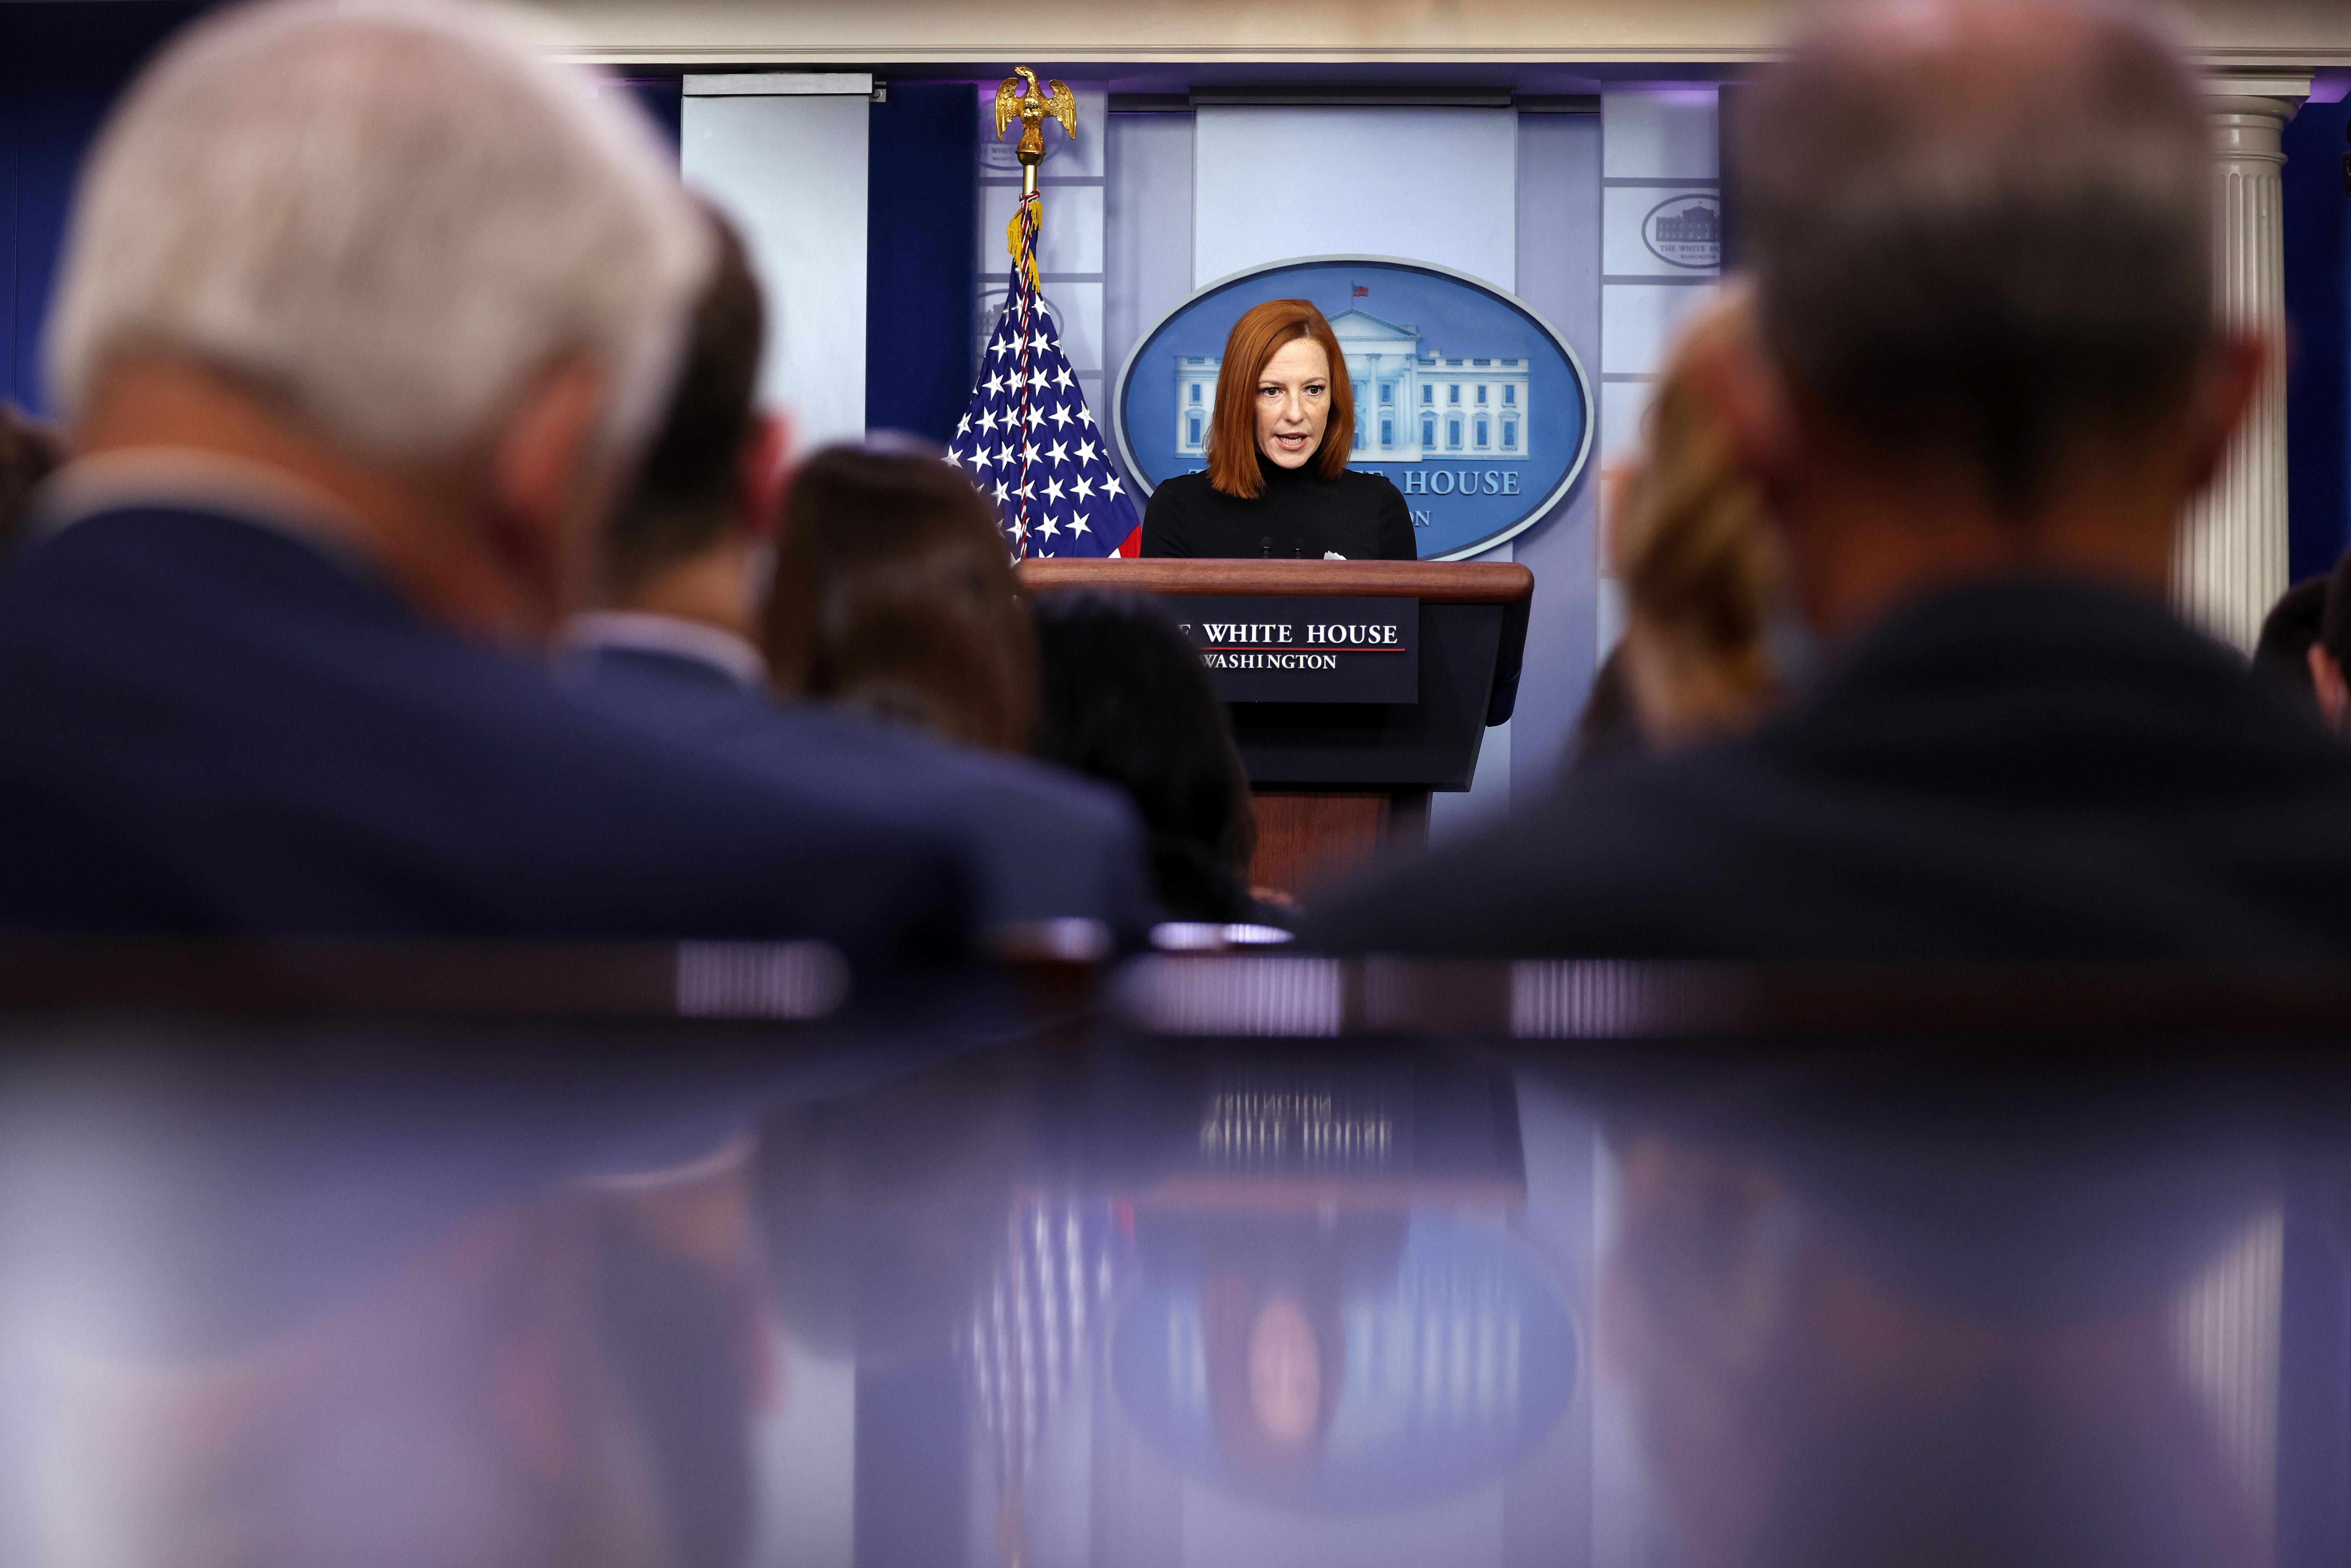 White House press secretary Jen Psaki speaks during a briefing at the White House on September 10.